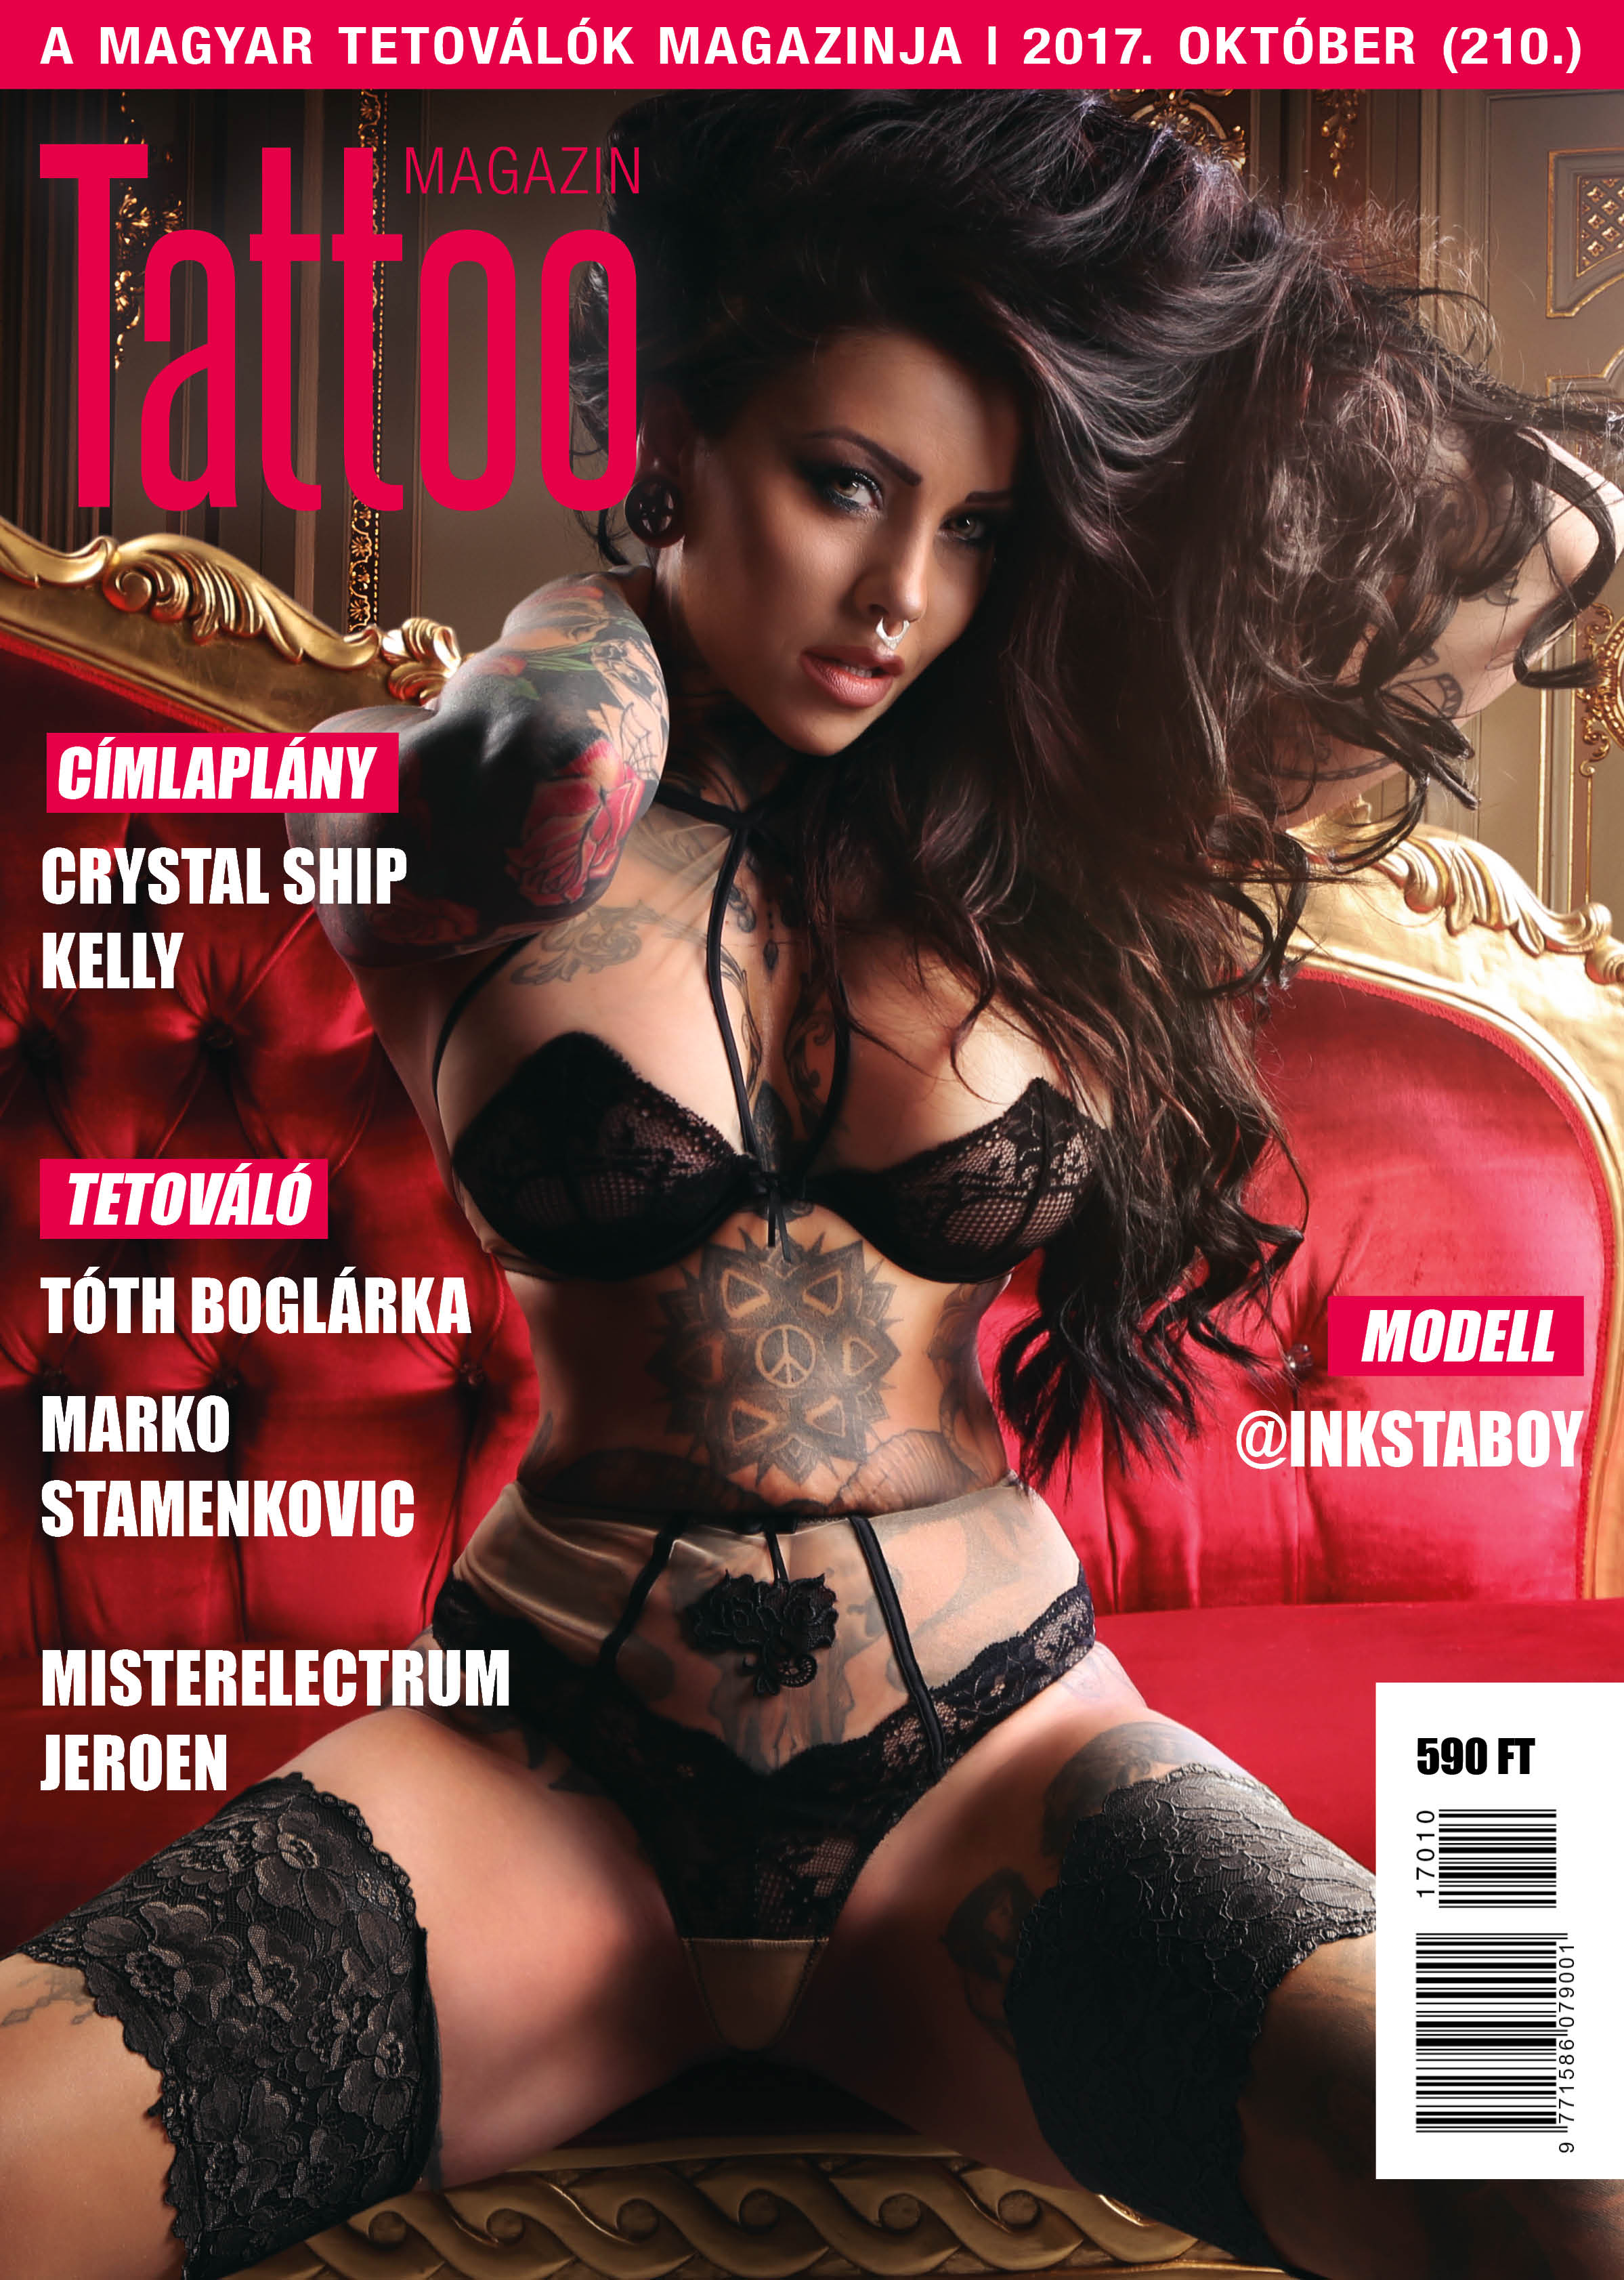 Tattoo 2017 Október (209.)